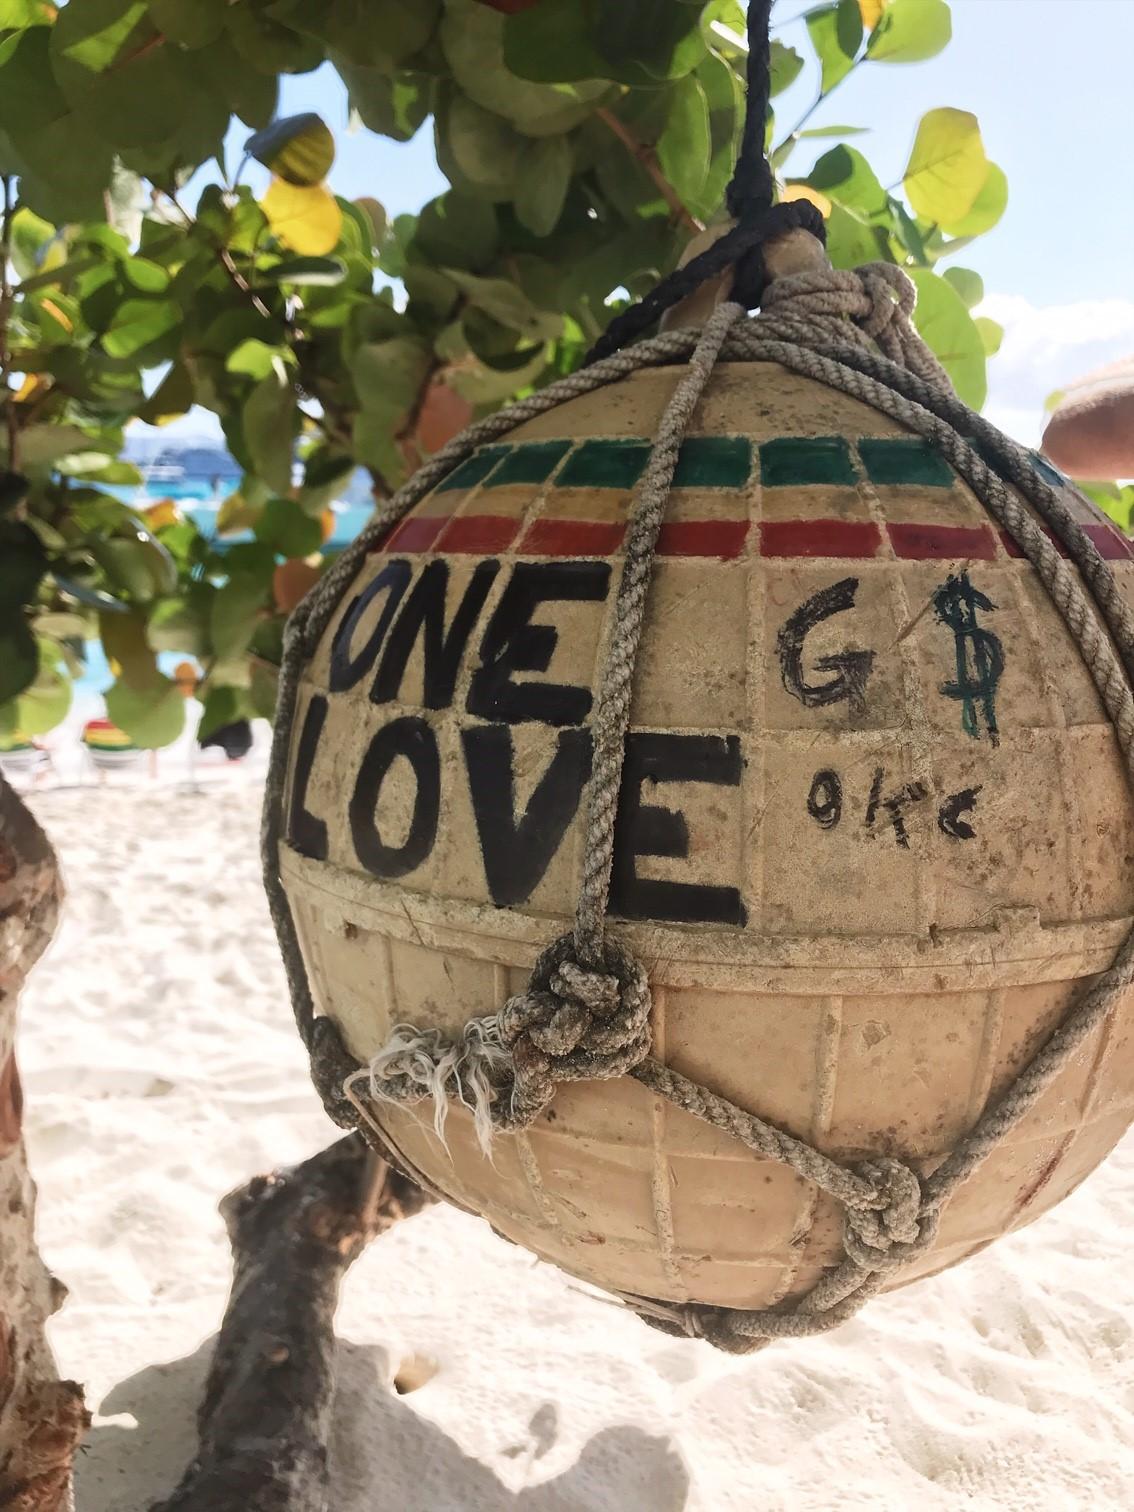 One Love Jost van Dyke - Eating out in the British Virgin Islands